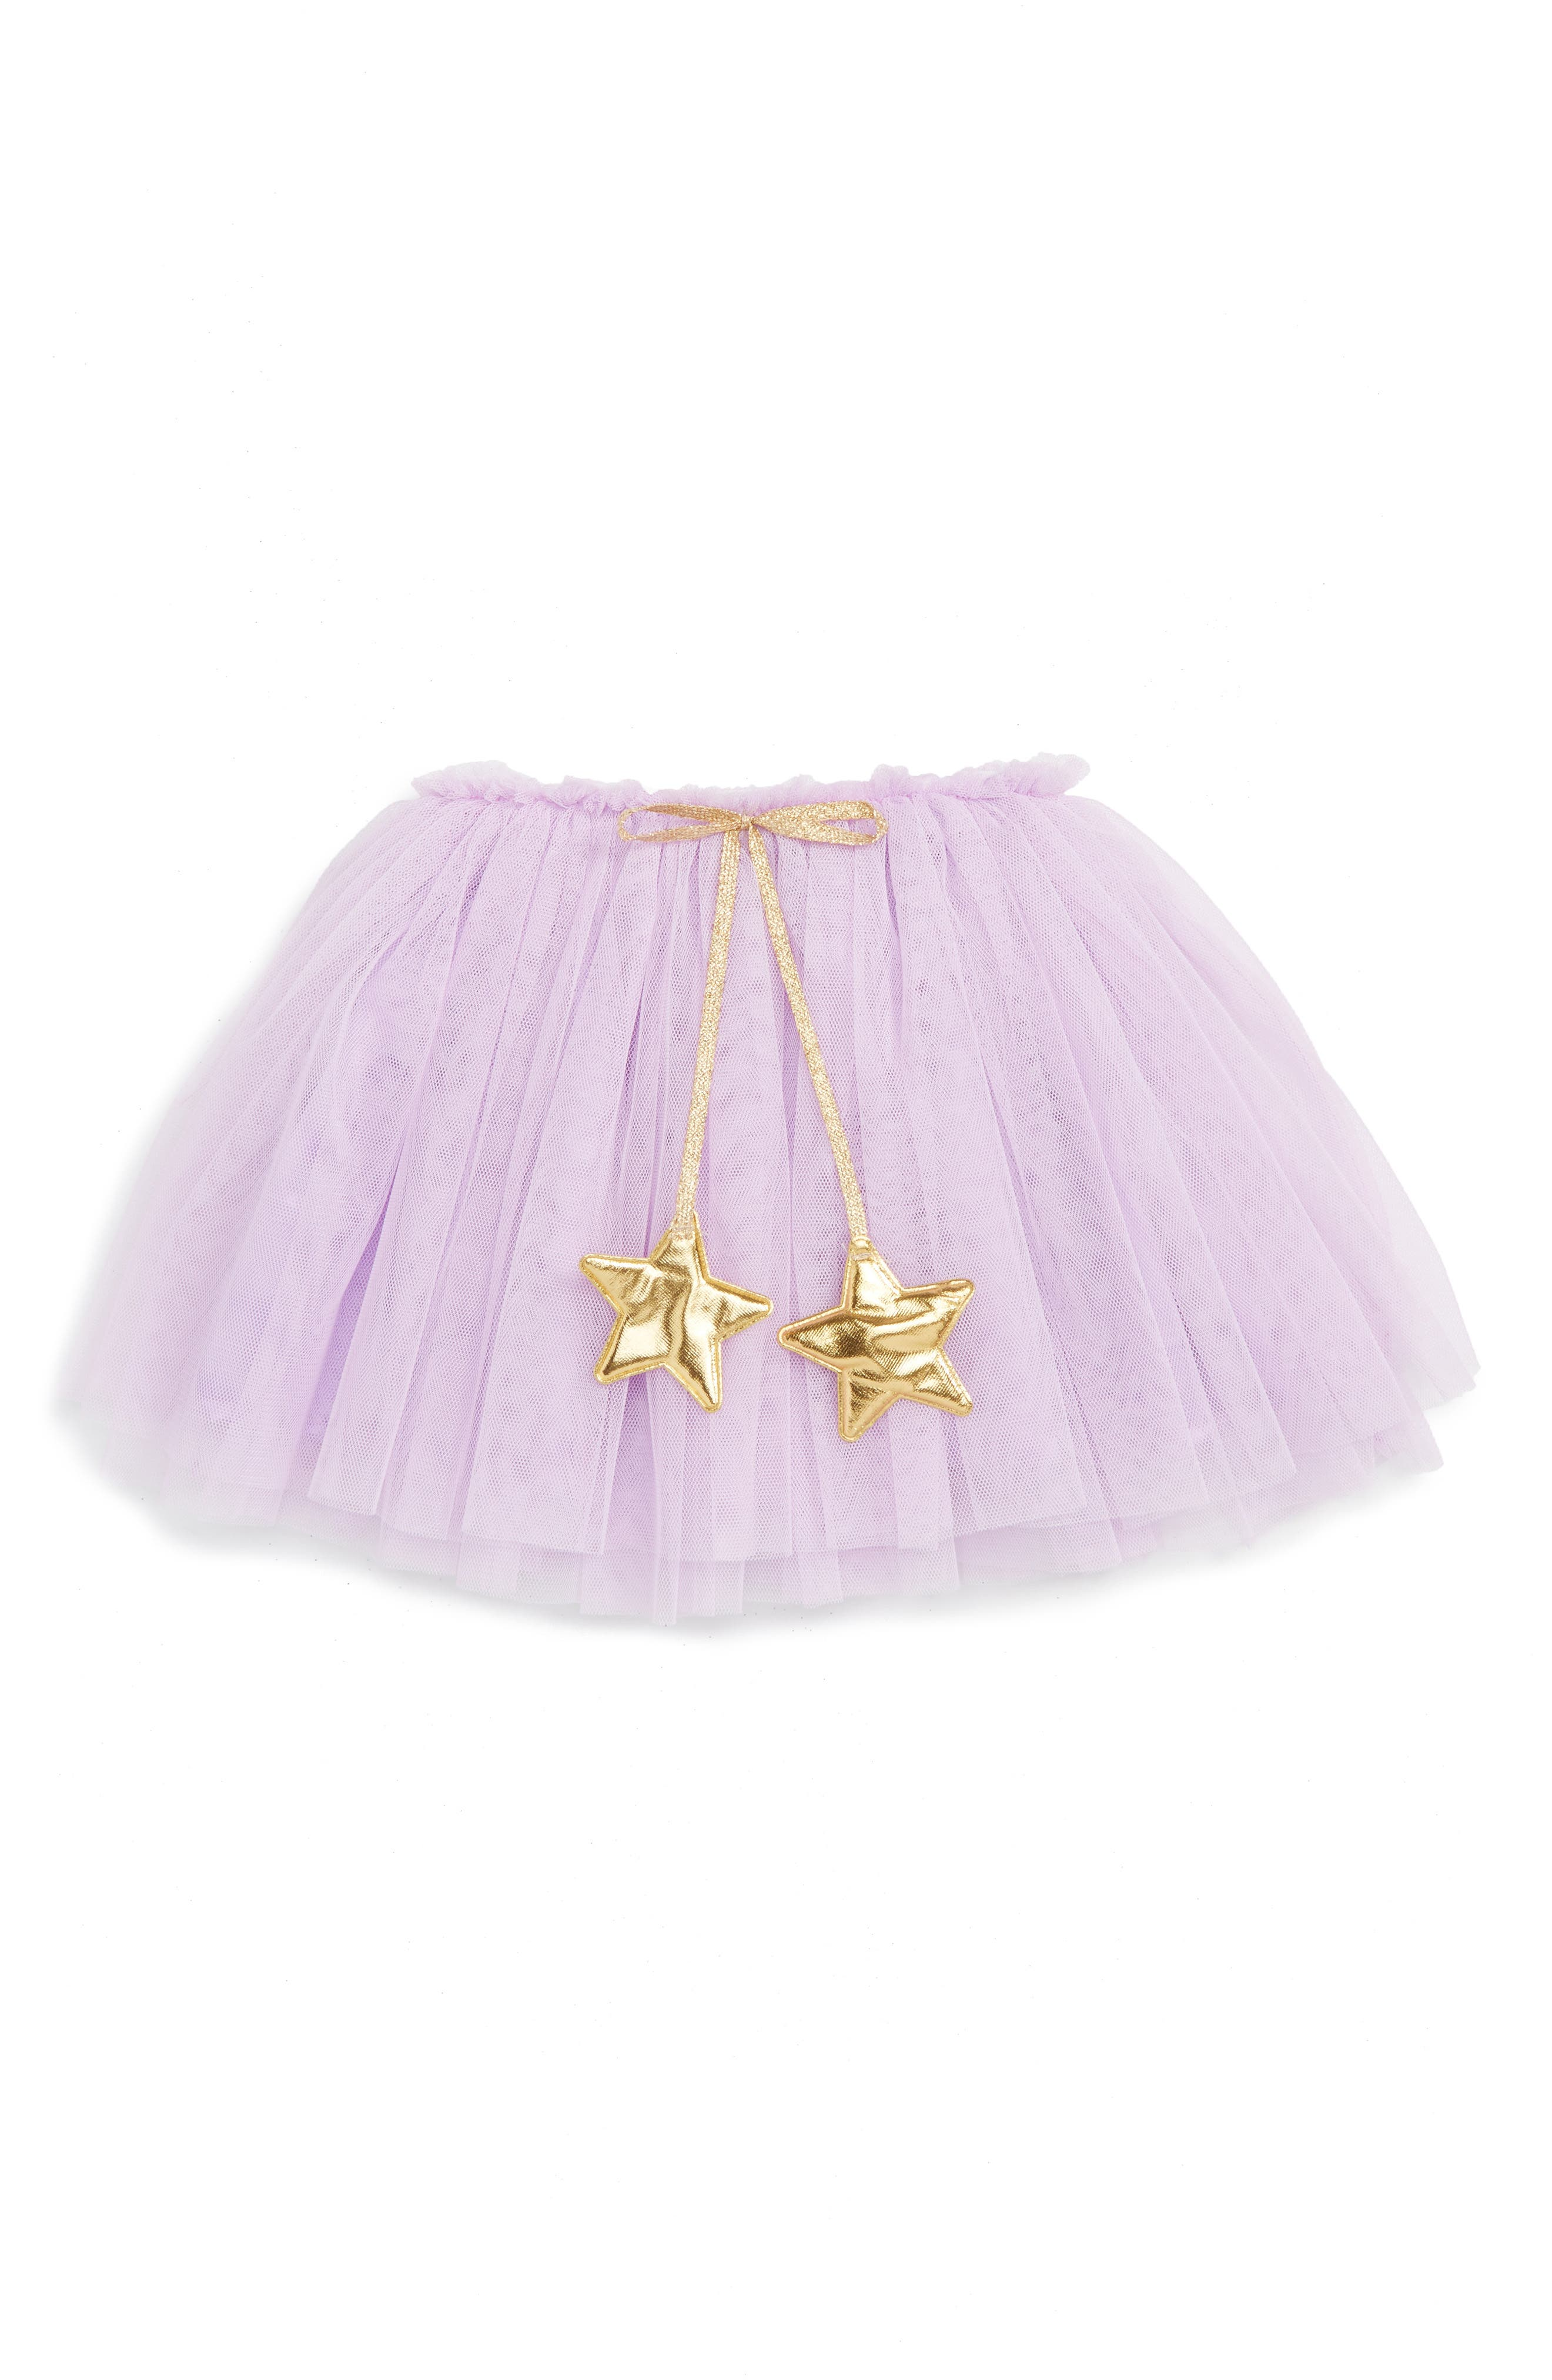 Gold Star Tutu Skirt,                         Main,                         color, PURPLE